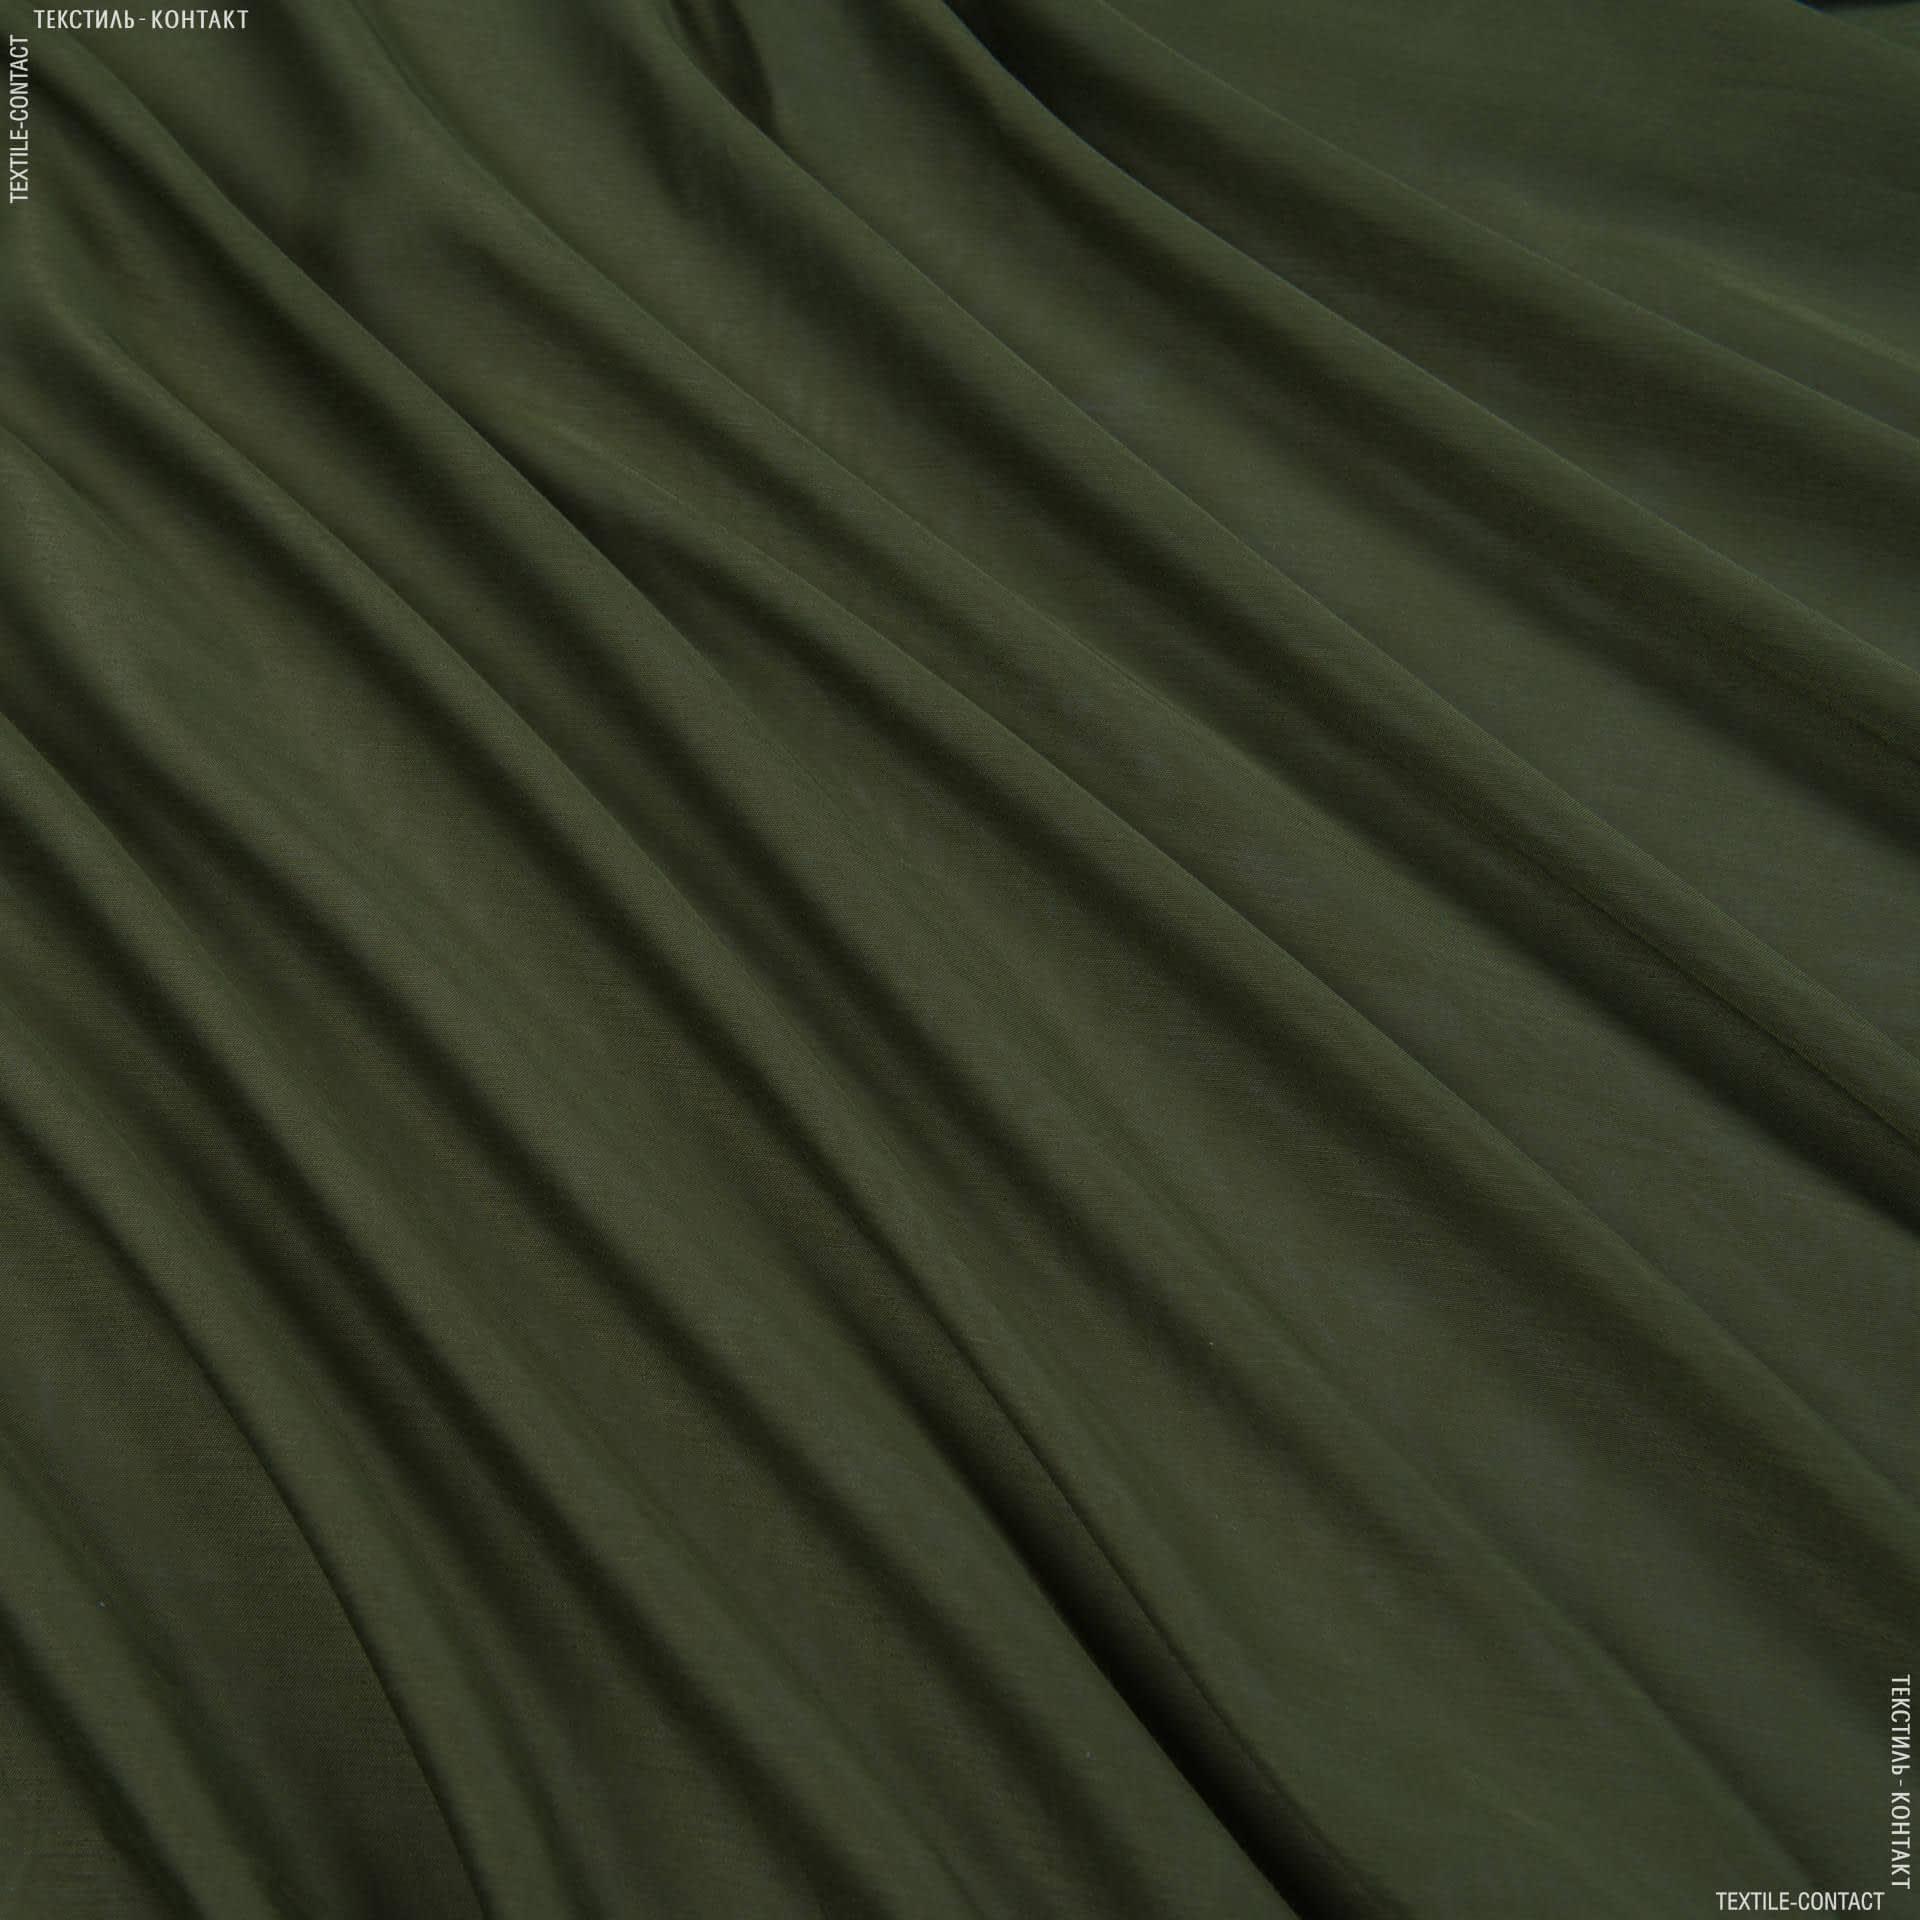 Ткани гардинные ткани - Тюль батист  морела  мох